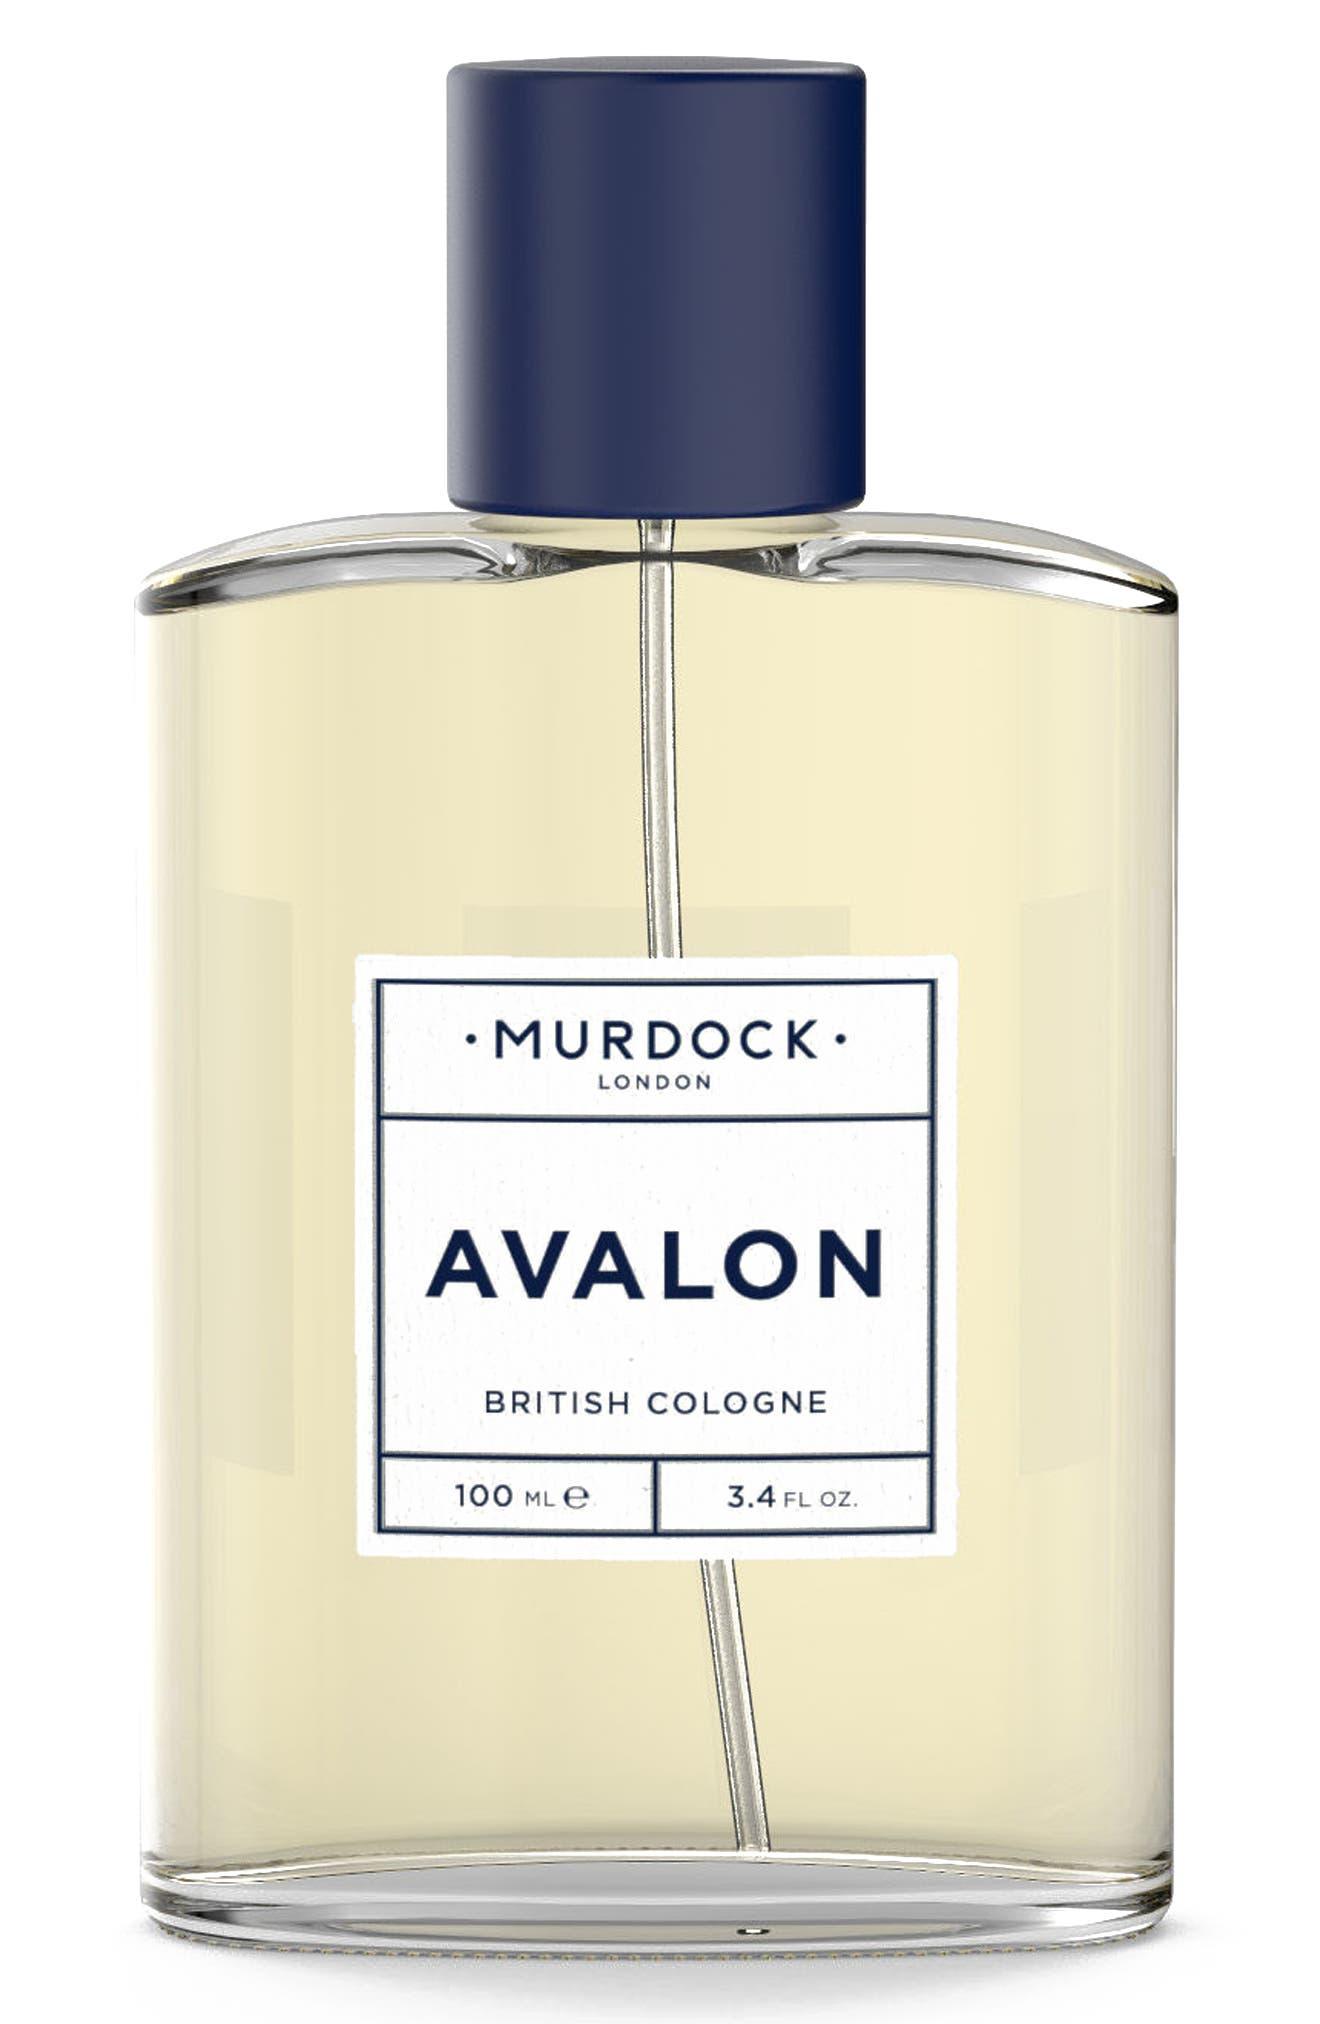 Murdock London Avalon Cologne